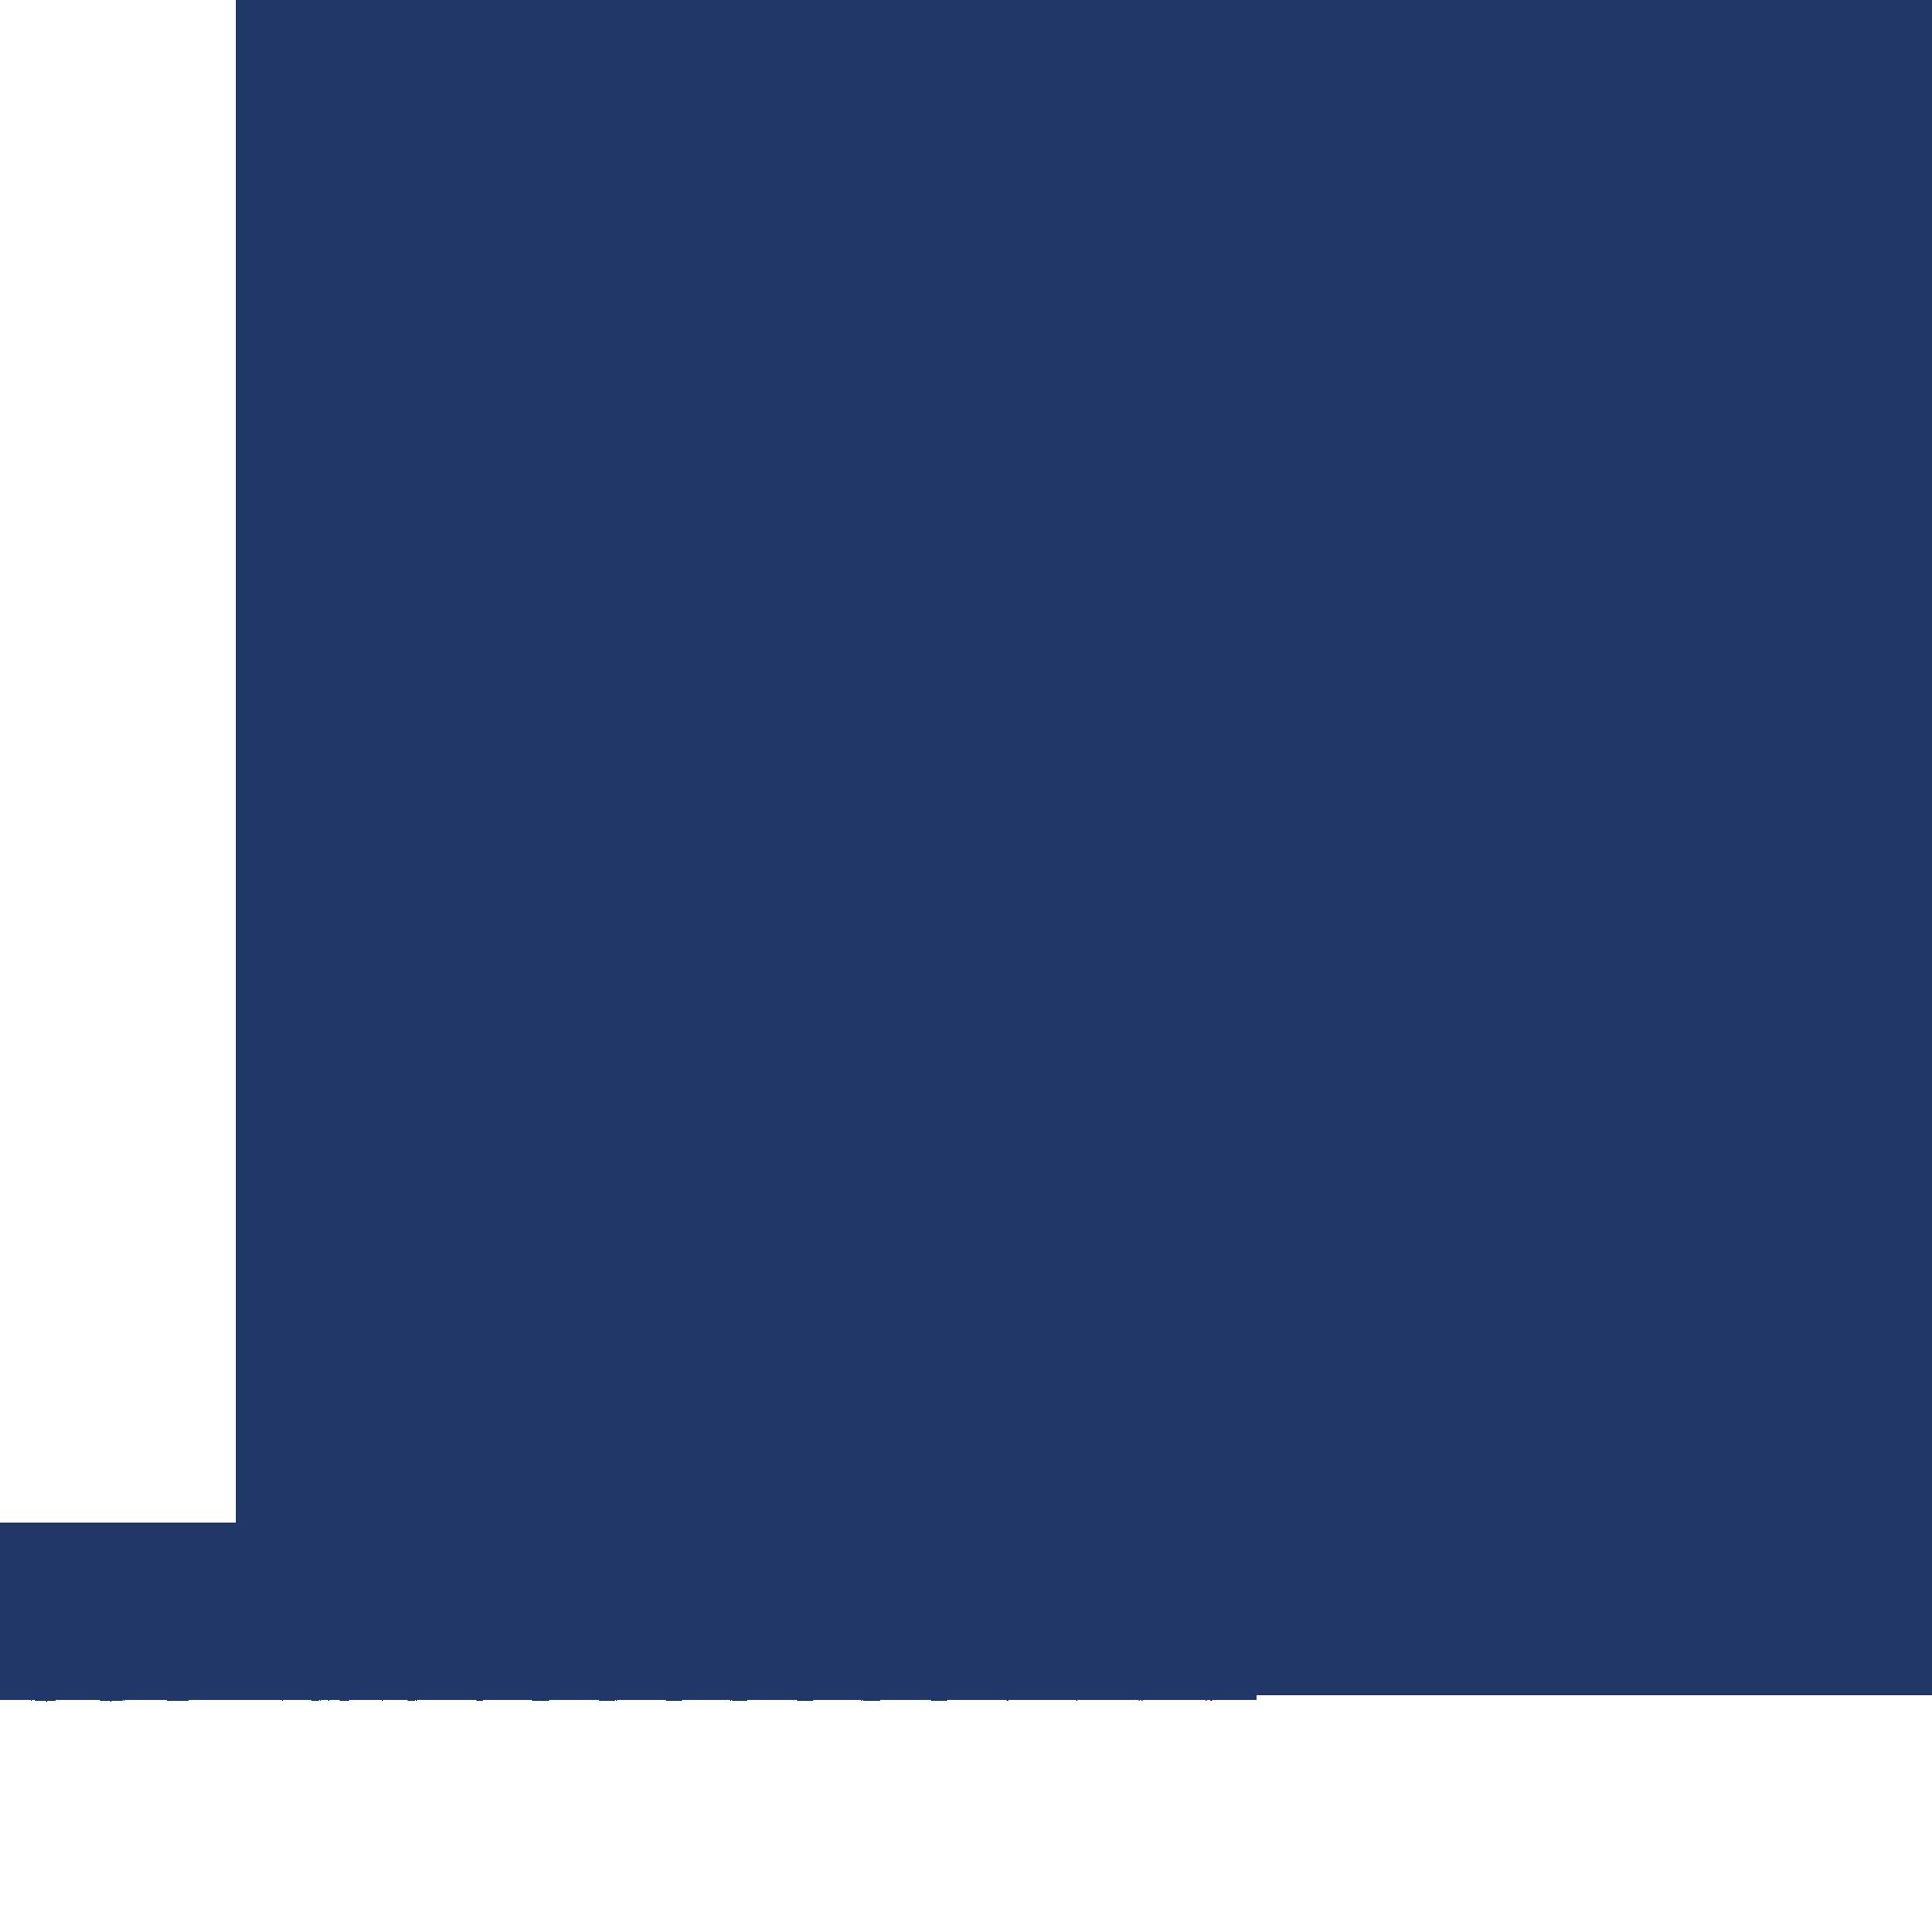 Strafrecht Mönchengladbach